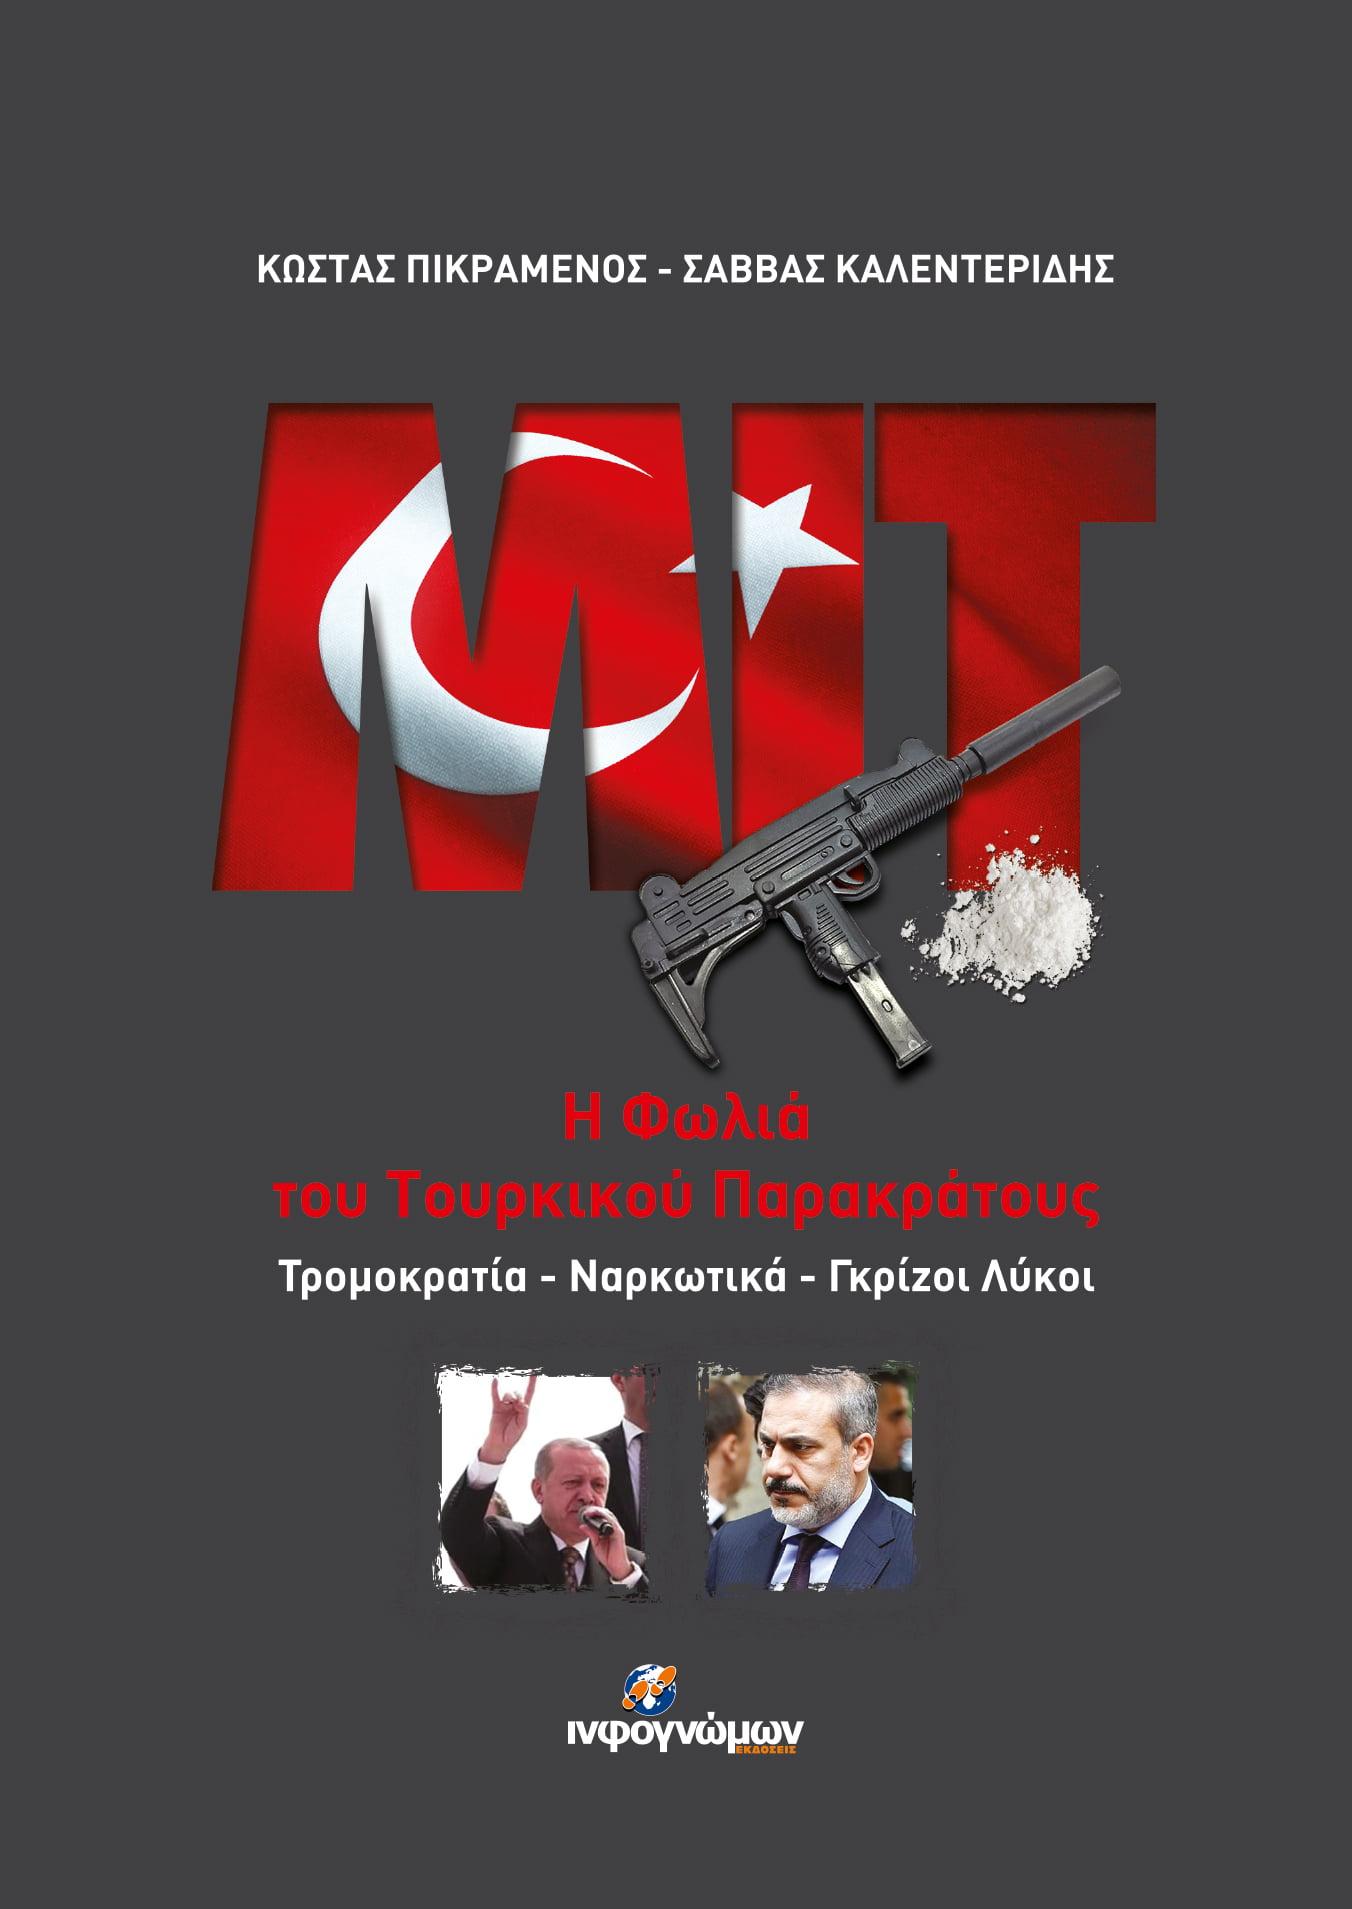 MIT: Η Φωλιά του Τουρκικού Παρακράτους – To best seller των Εκδόσεων Ινφογνώμων